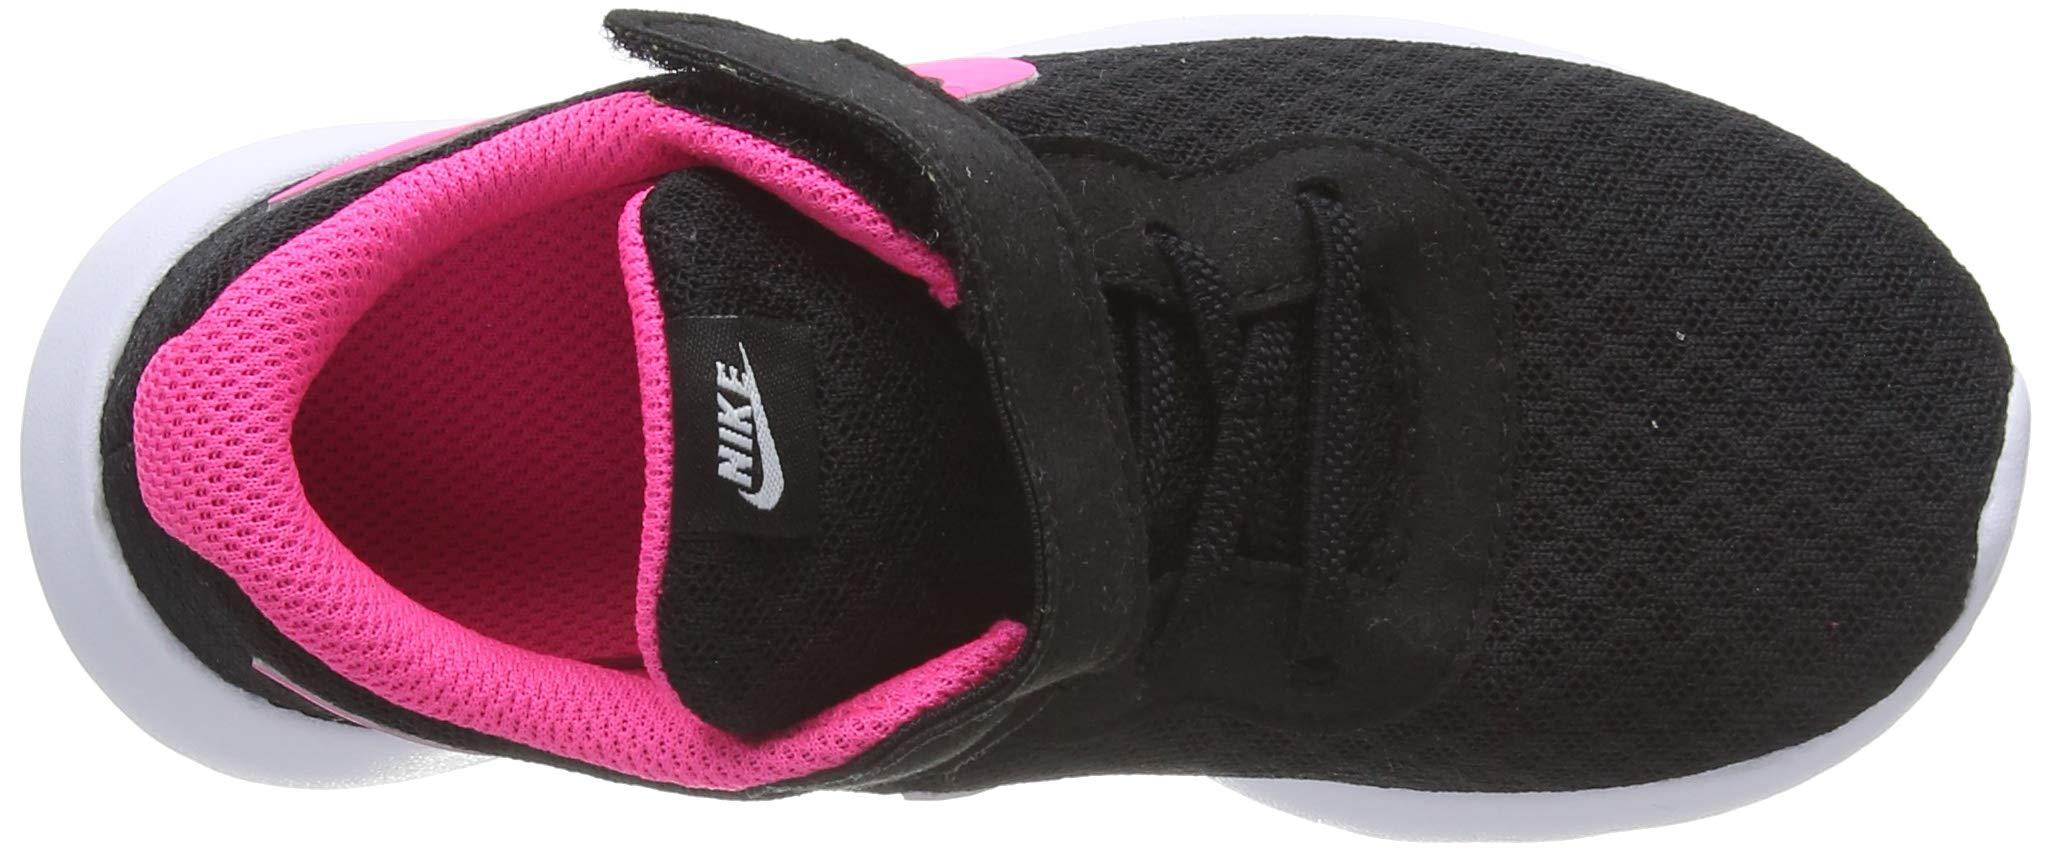 Nike Baby Girl's Tanjun Sneakers